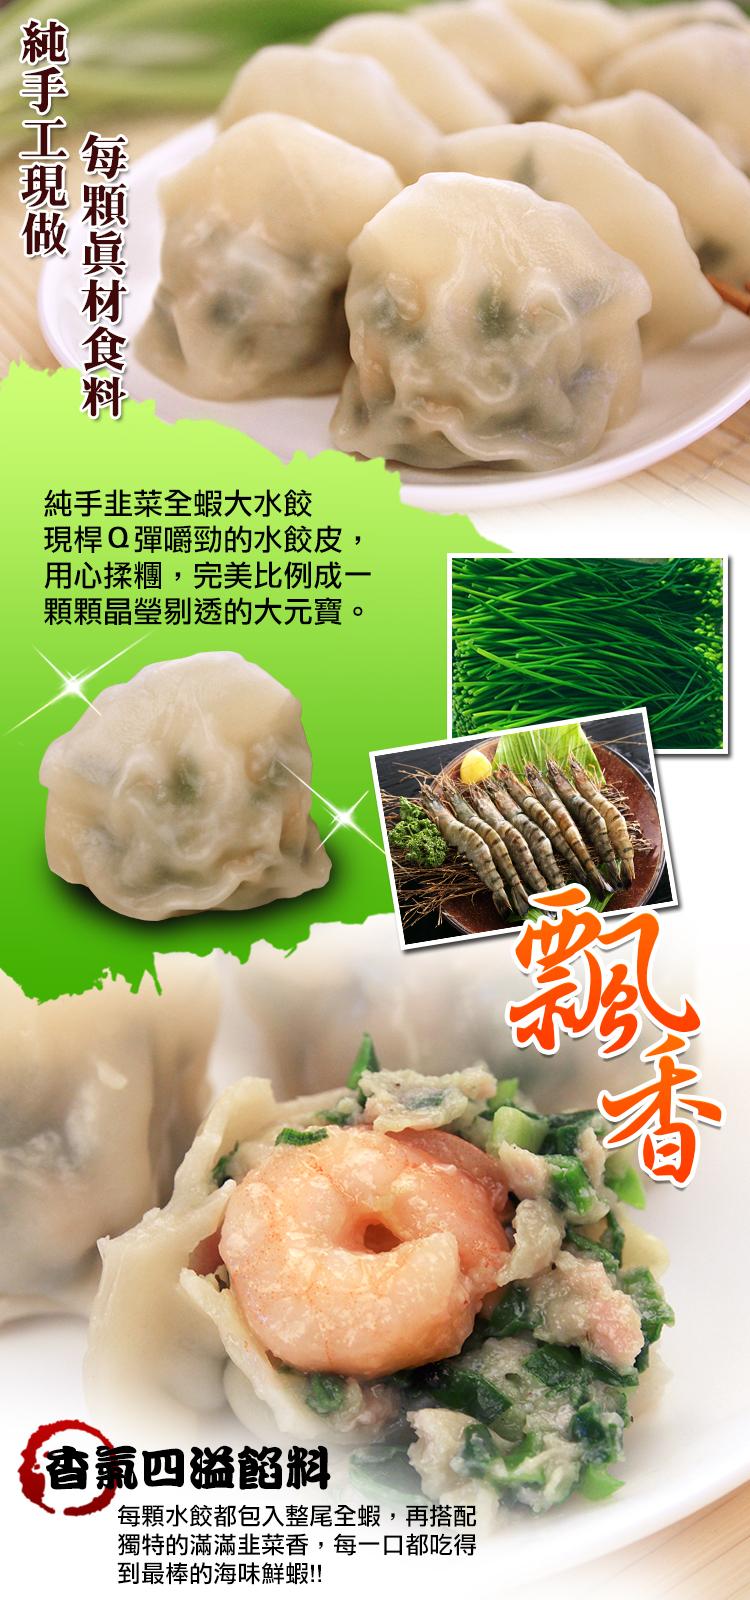 chivesshrimp09